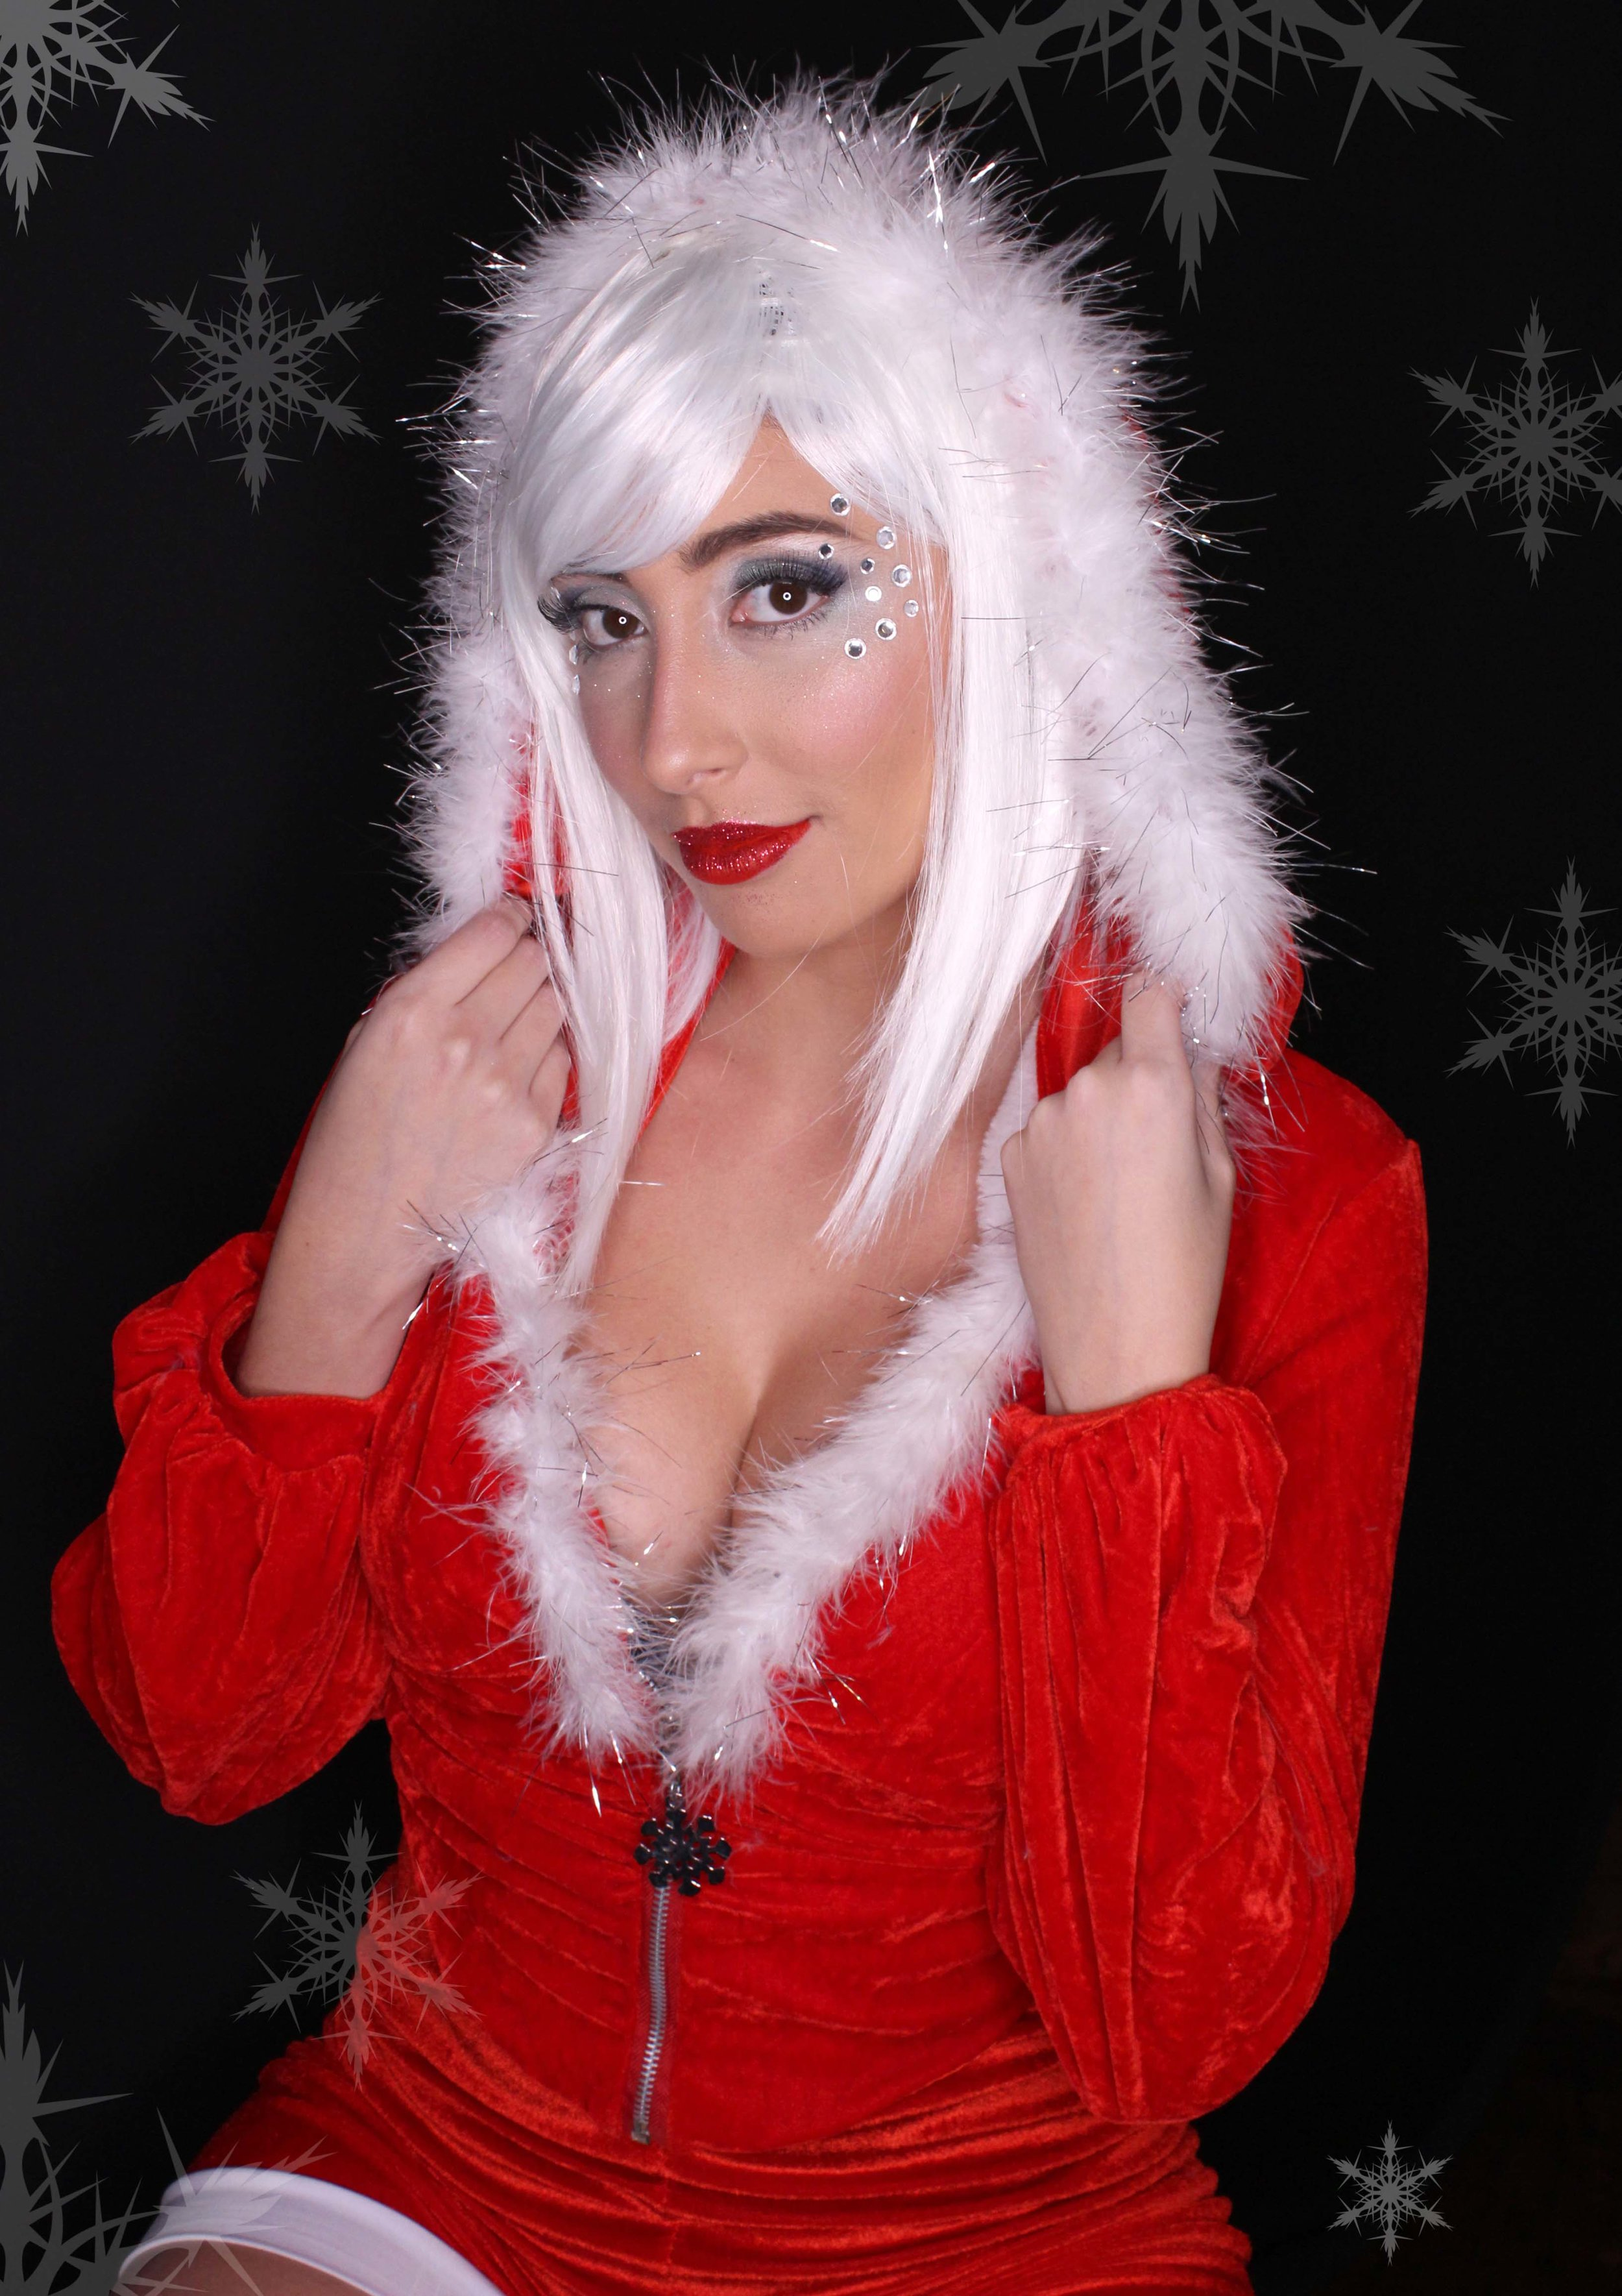 Mrs. Santa adult makeup